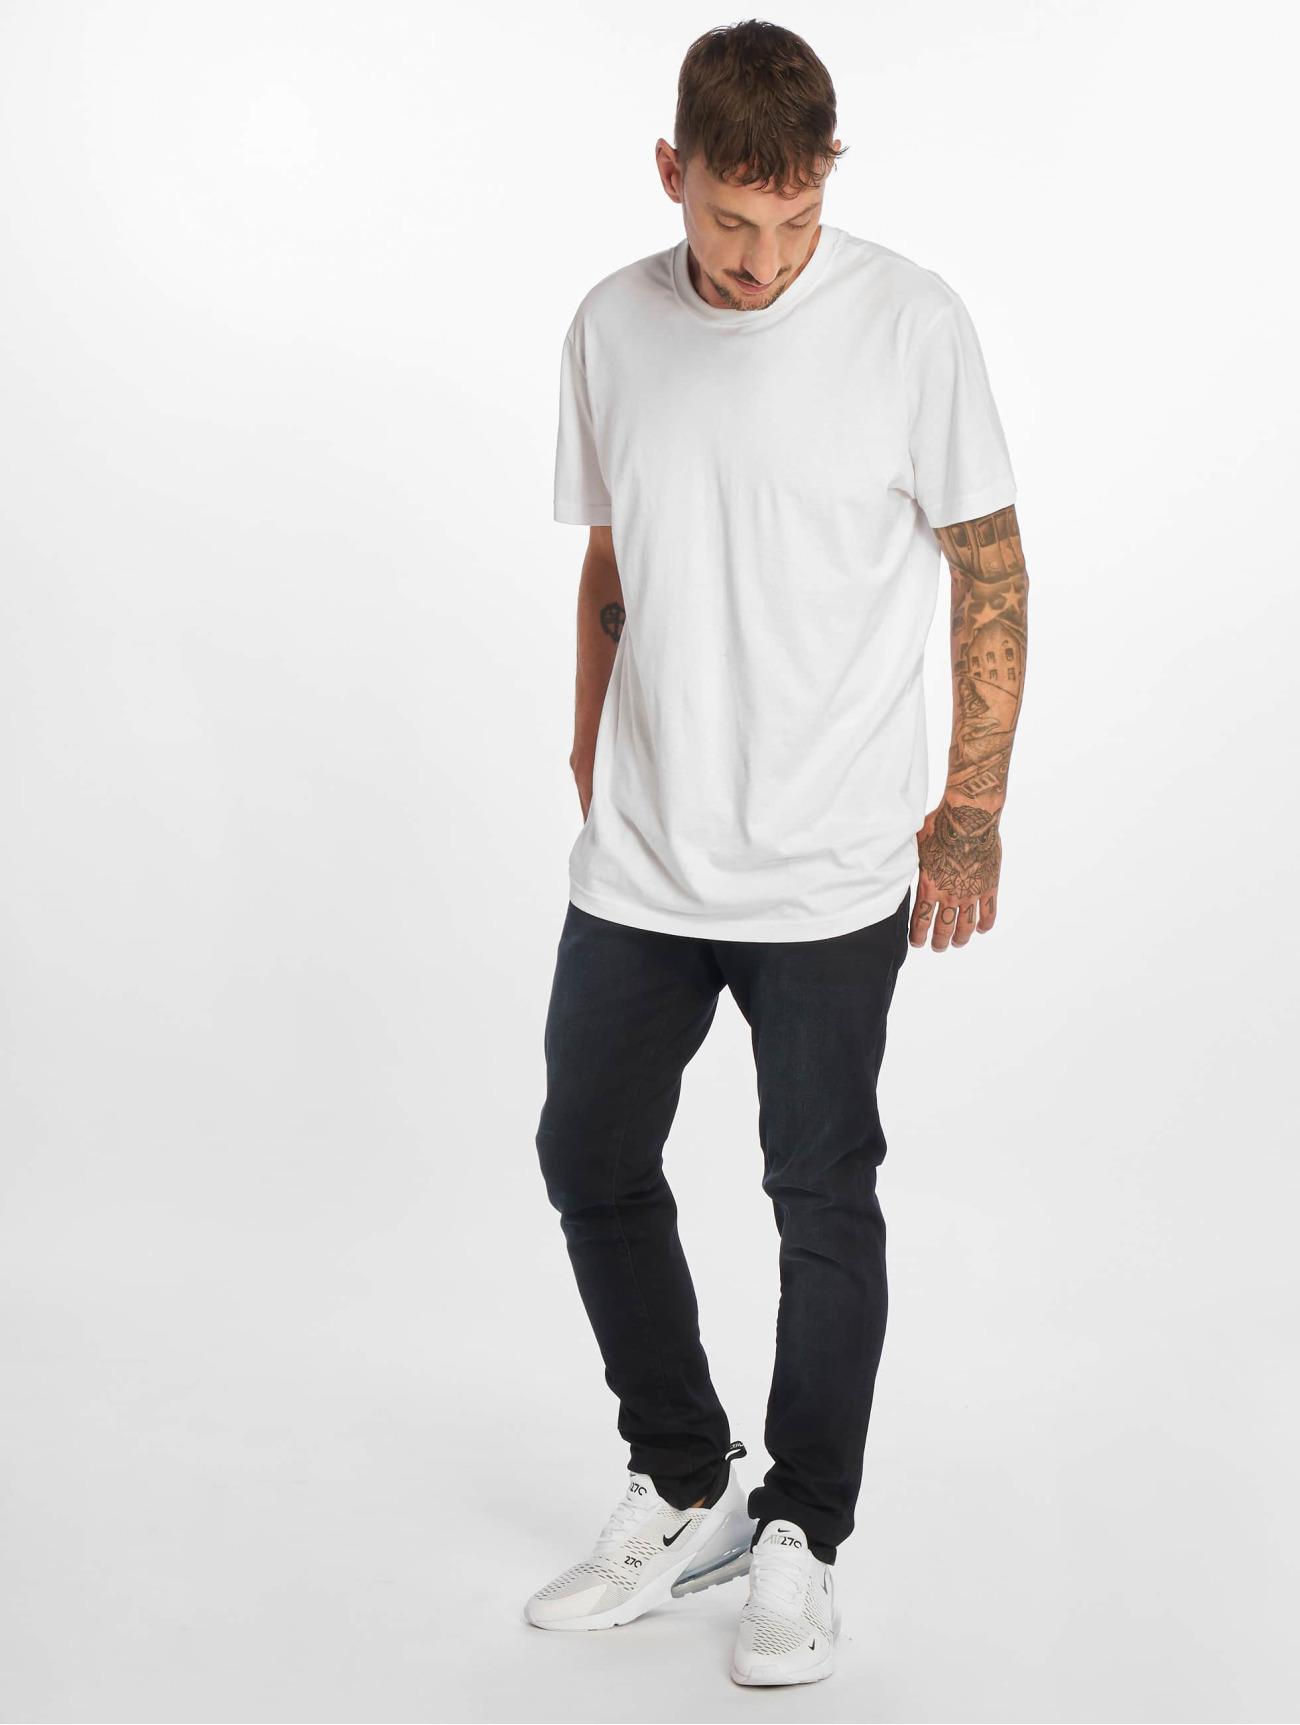 DEF Jeans / Slim Fit Jeans Ventura i blå 657897 Män Jeans